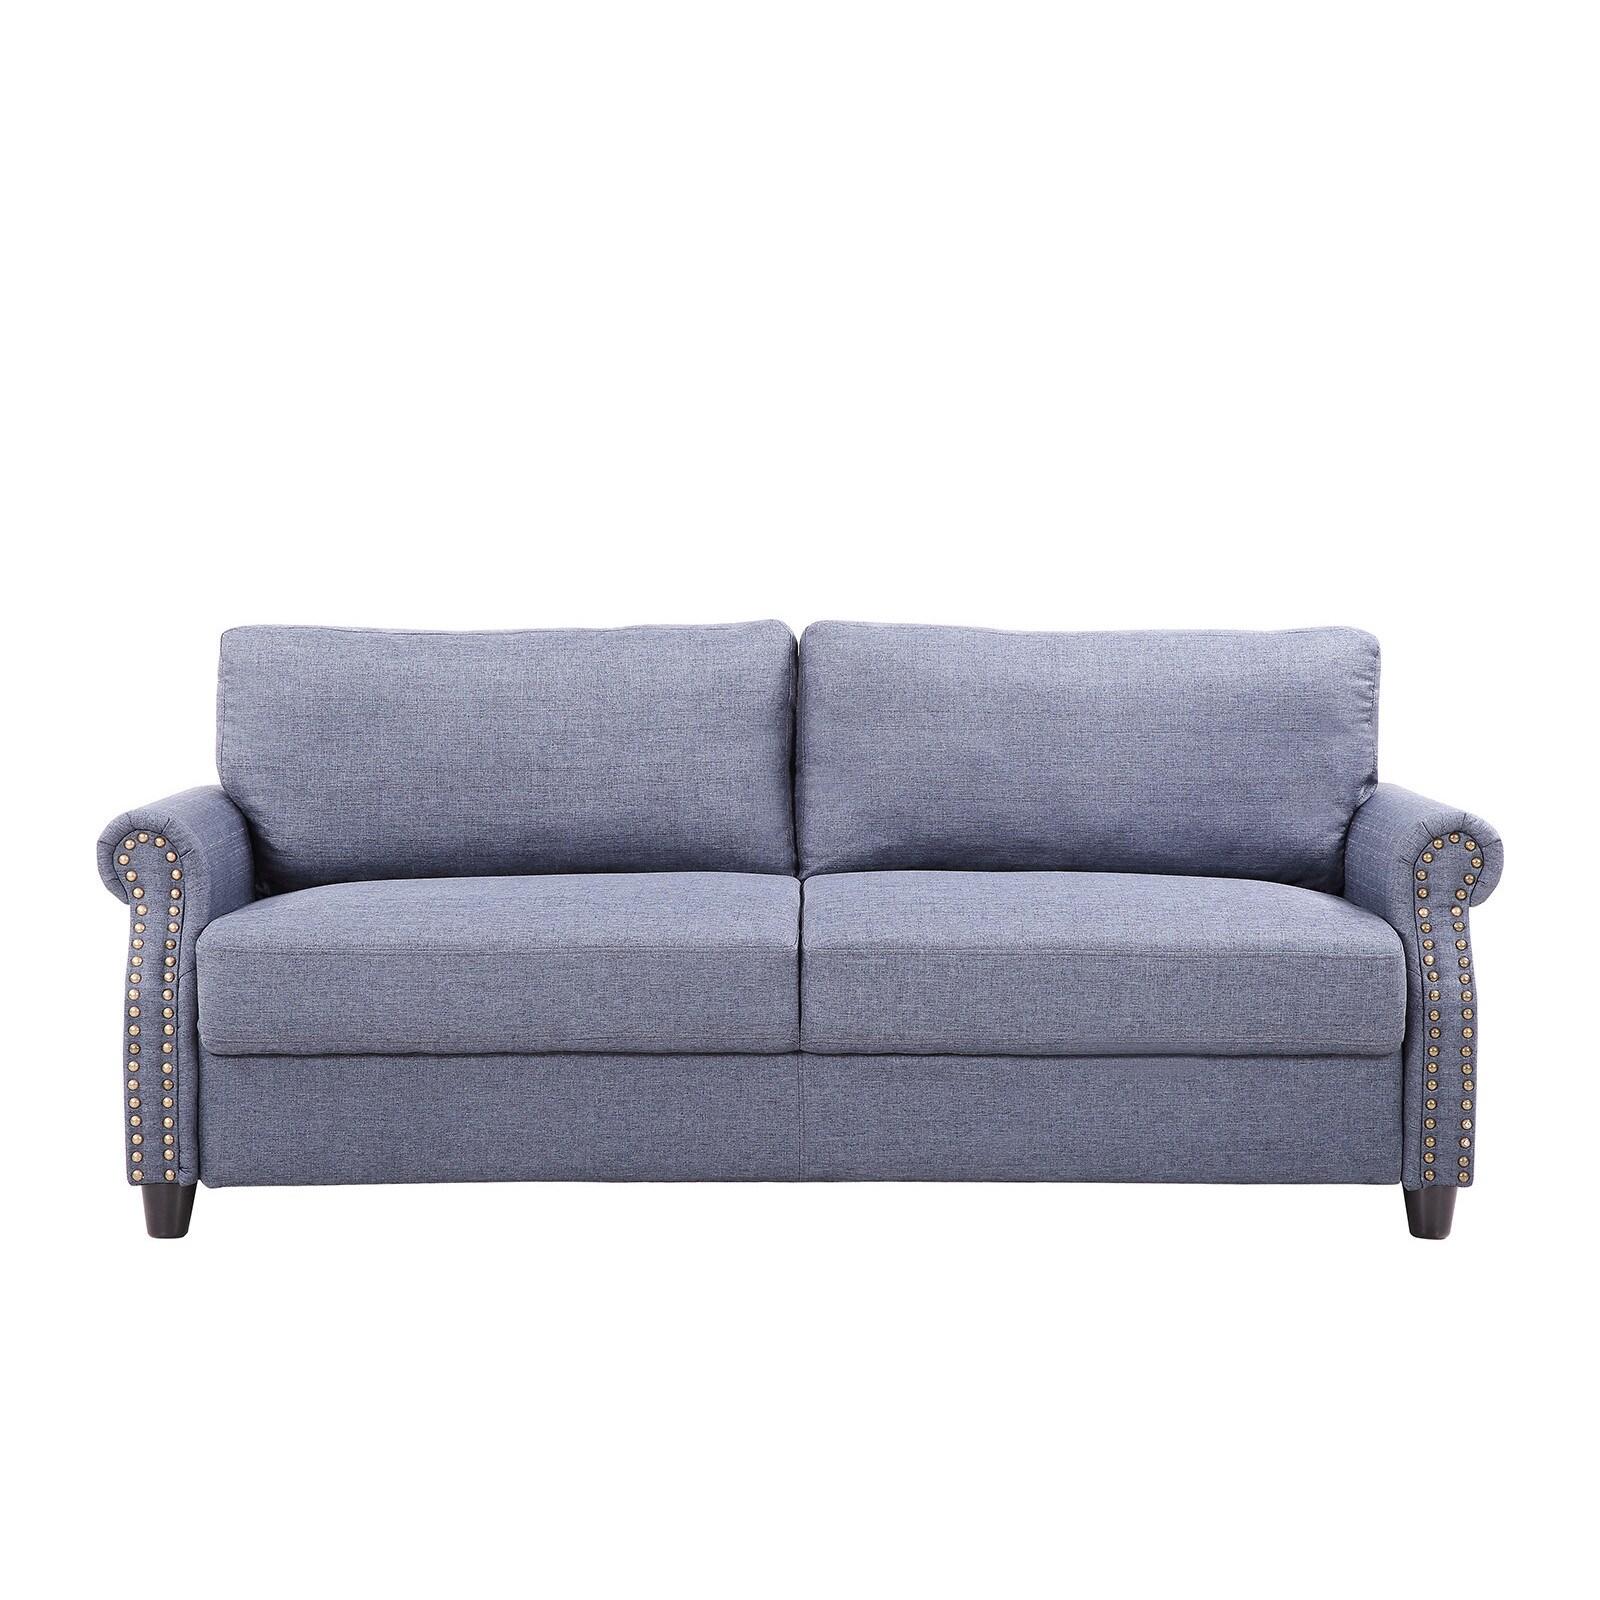 Living Room Linen Nailhead Storage Sofa - Free Shipping Today ...